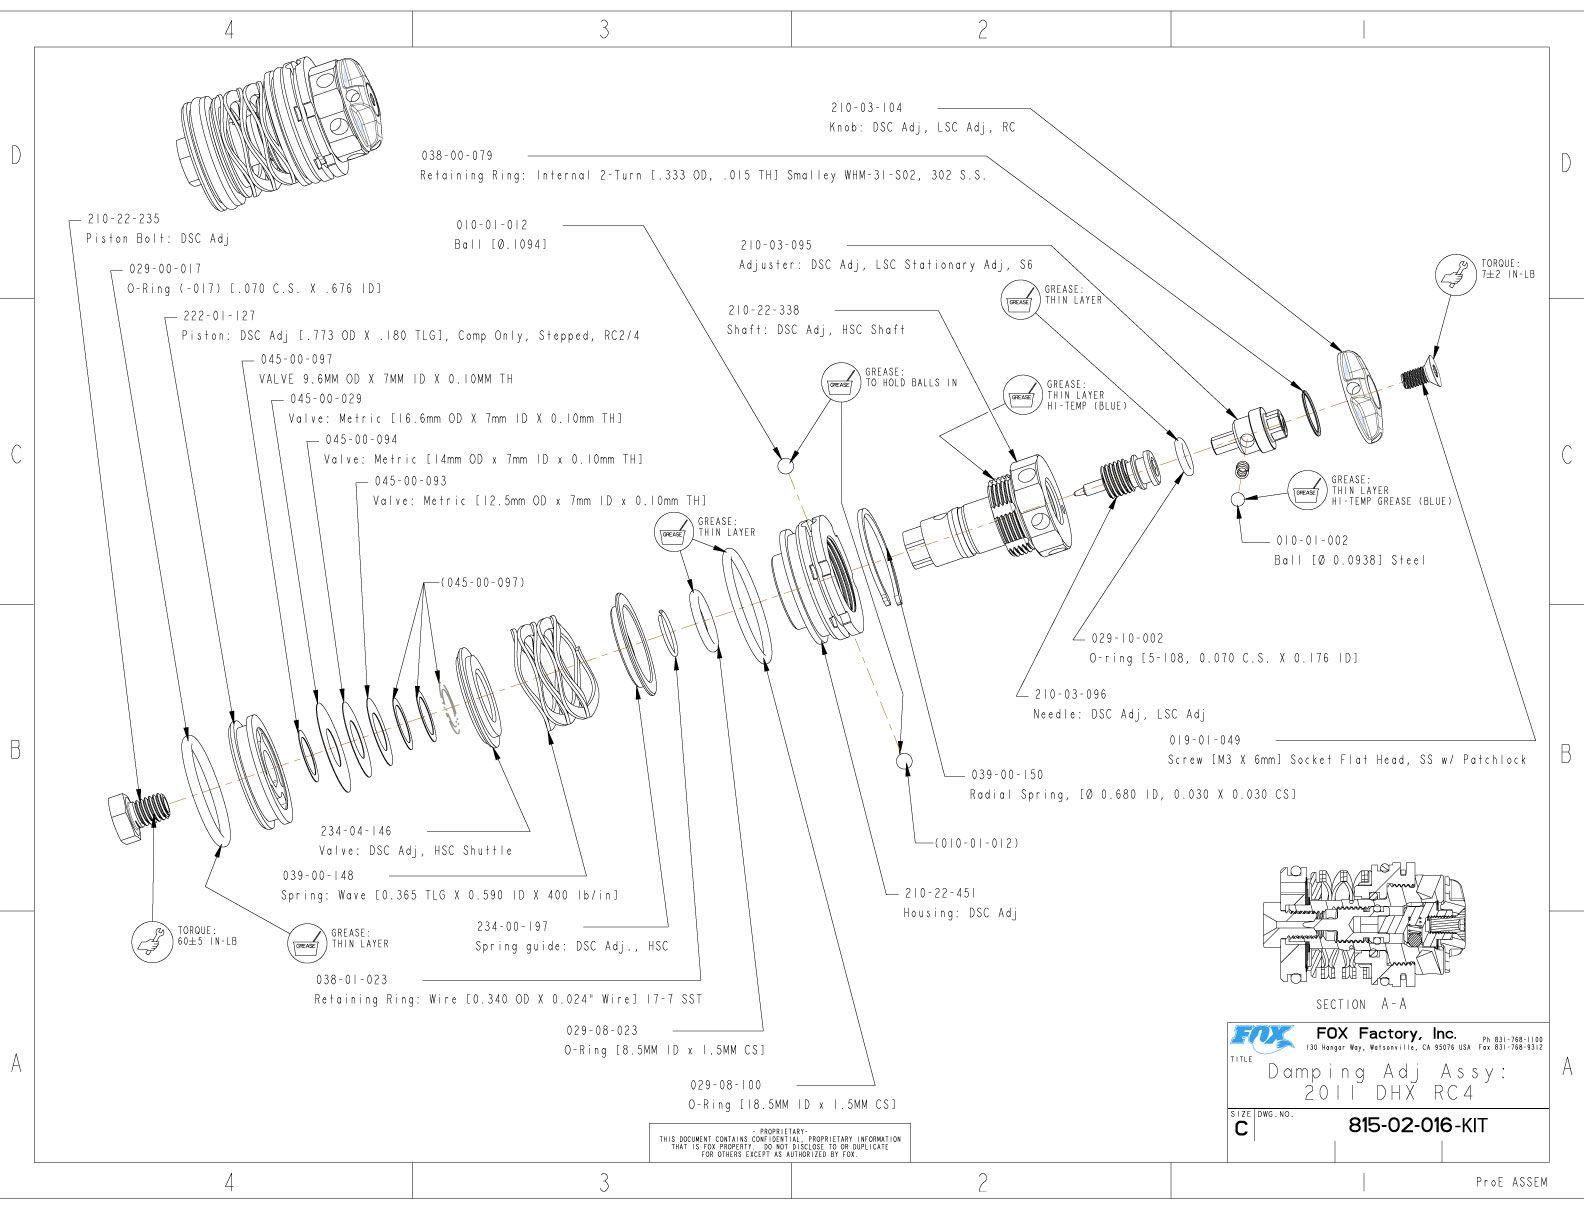 815-02-016-KIT Damping Adj Assy: 2011 DHX RC4